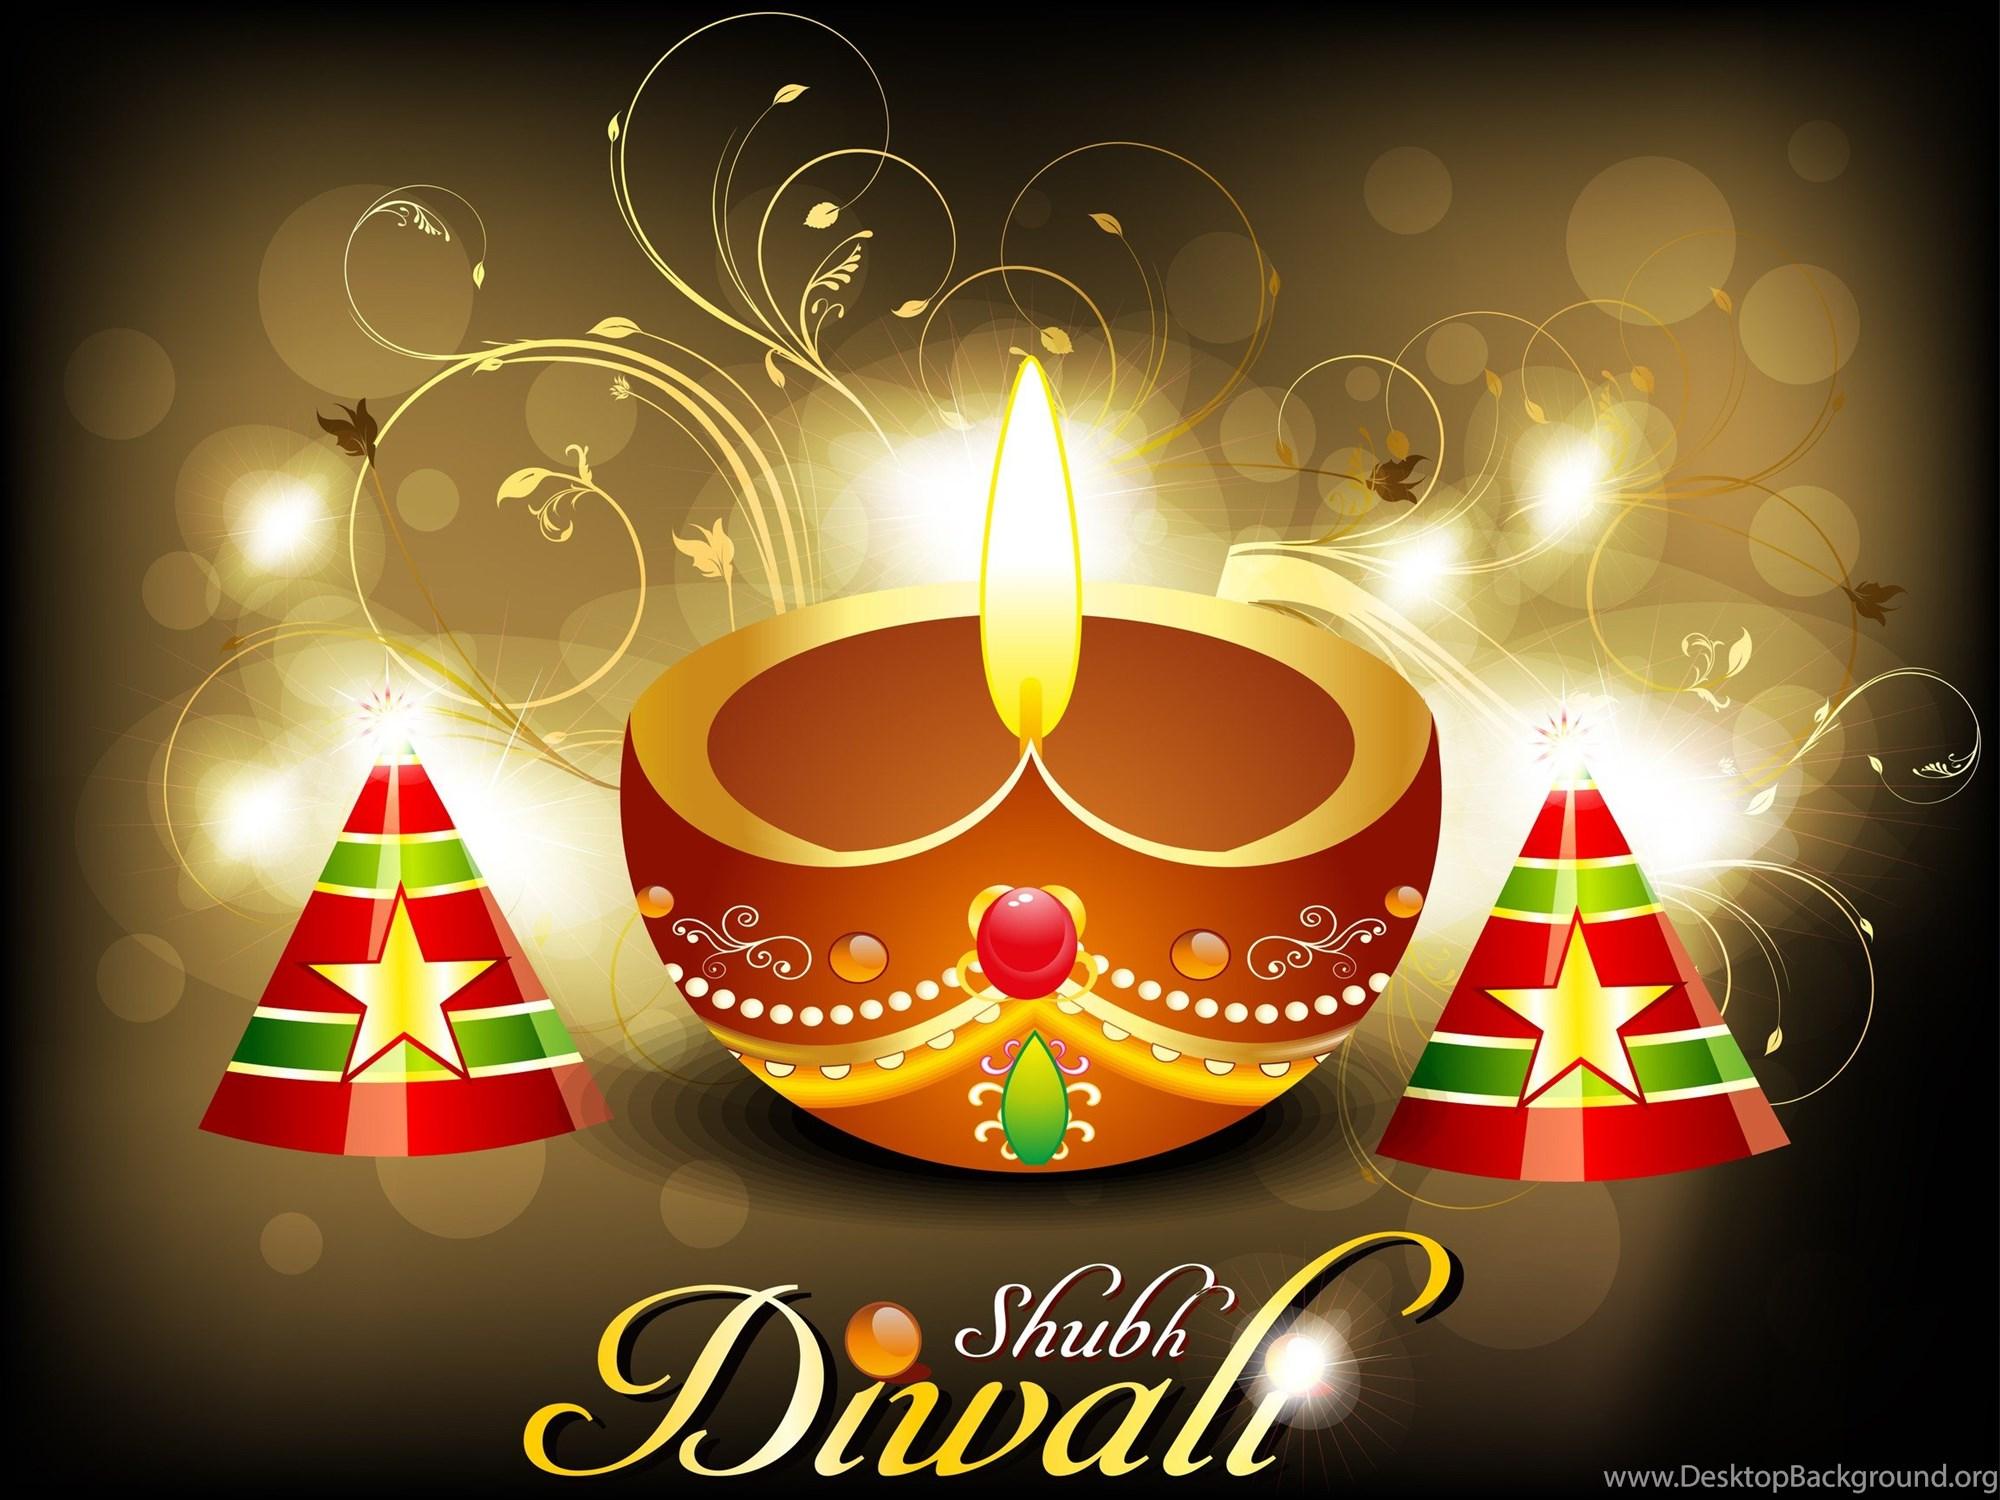 Happy Diwali Free Download Hd Wallpapersg Desktop Background